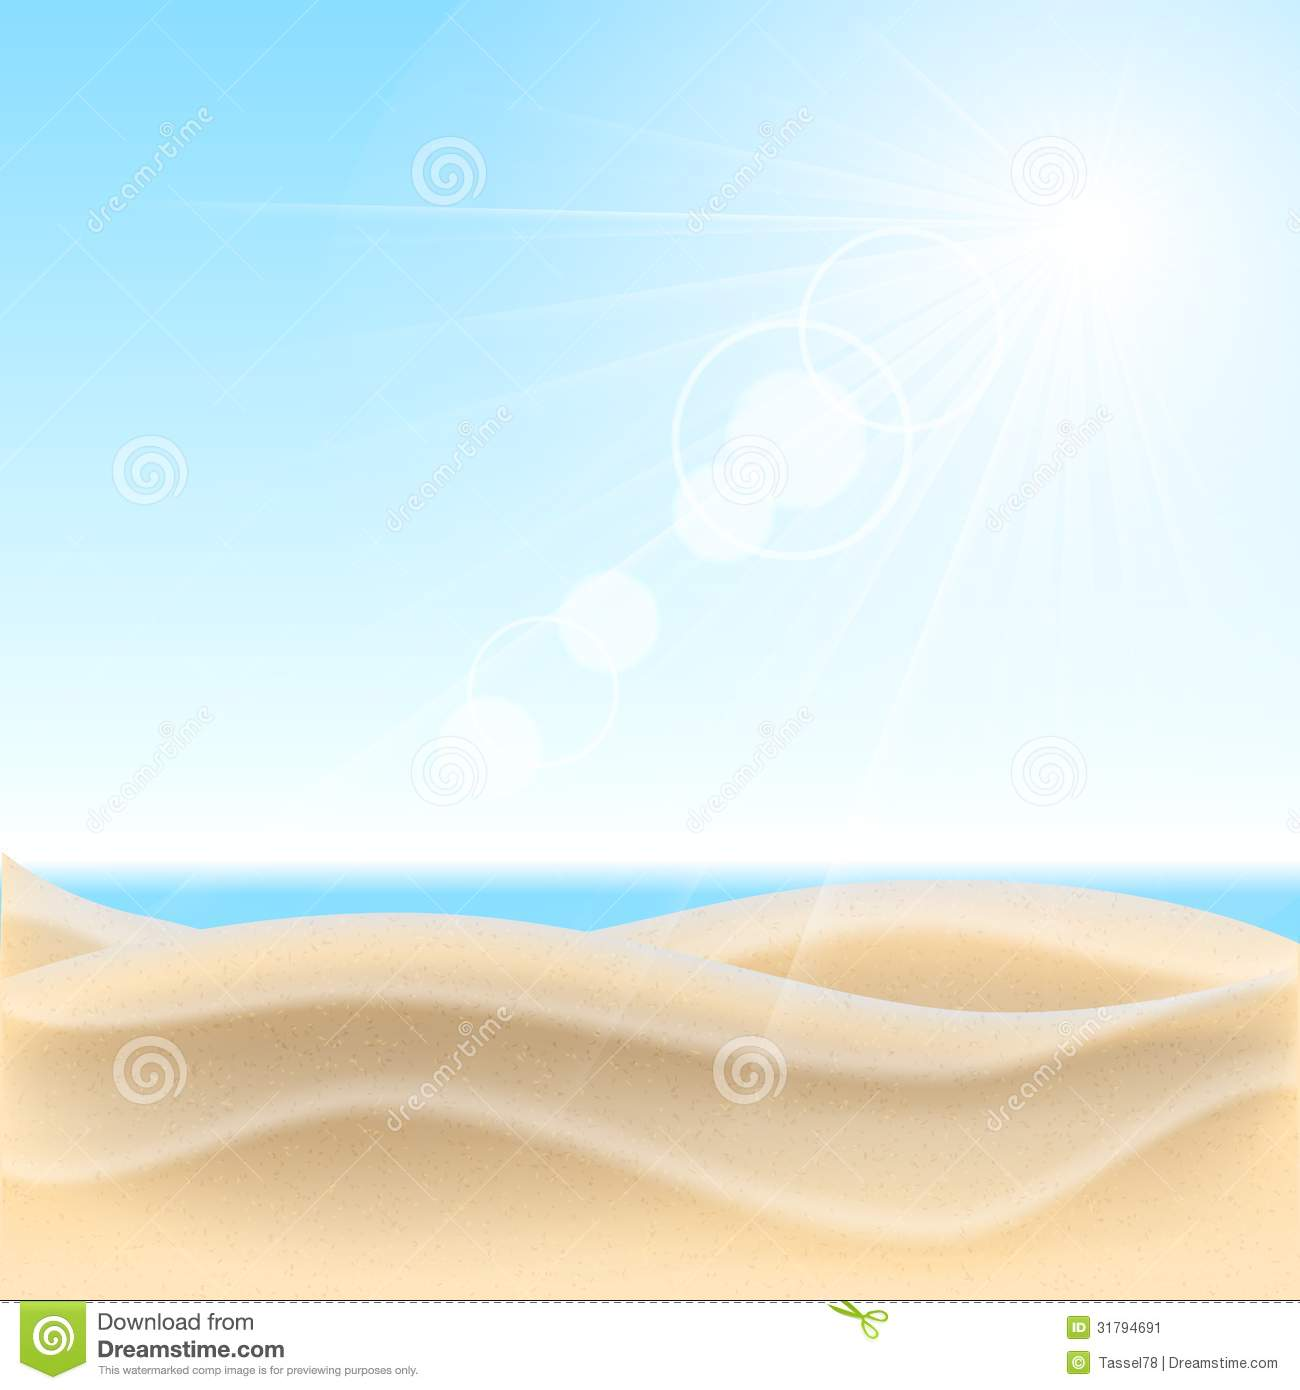 Beach Sand Background Clipart